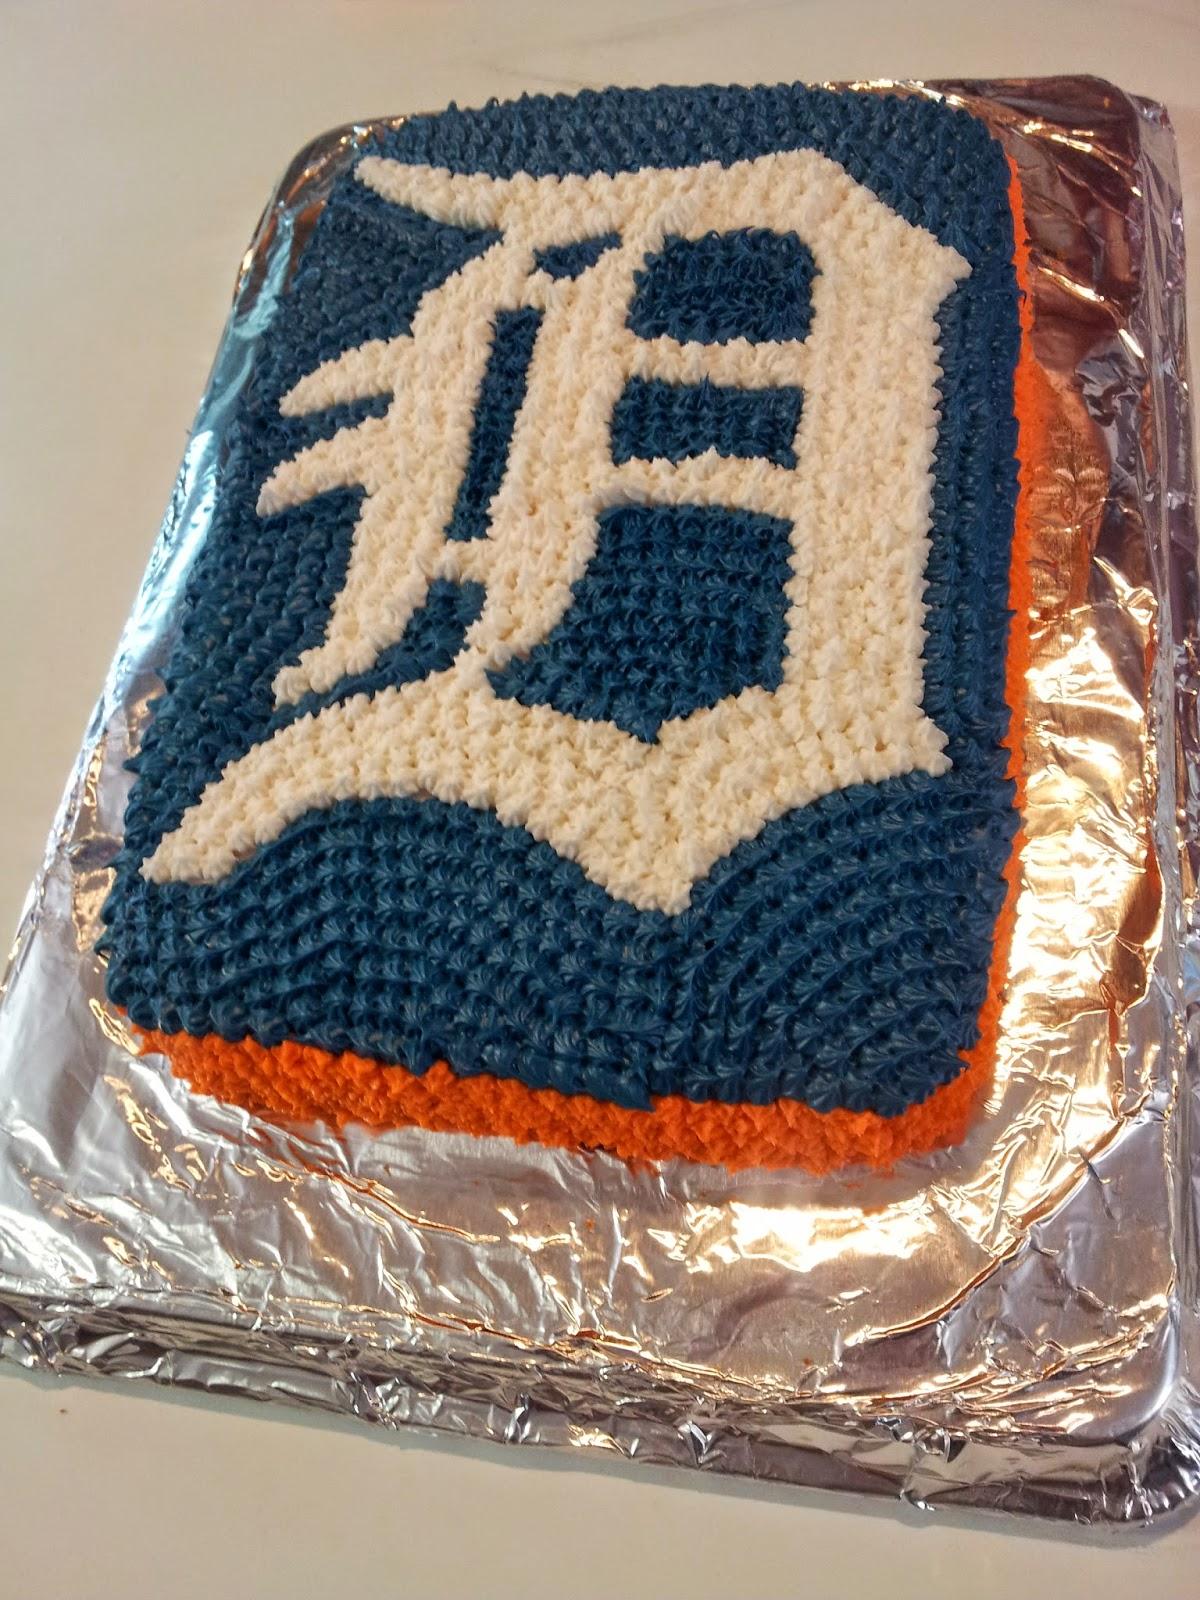 http://workingmomwonders.blogspot.com/2014/03/detroit-tigers-cake.html